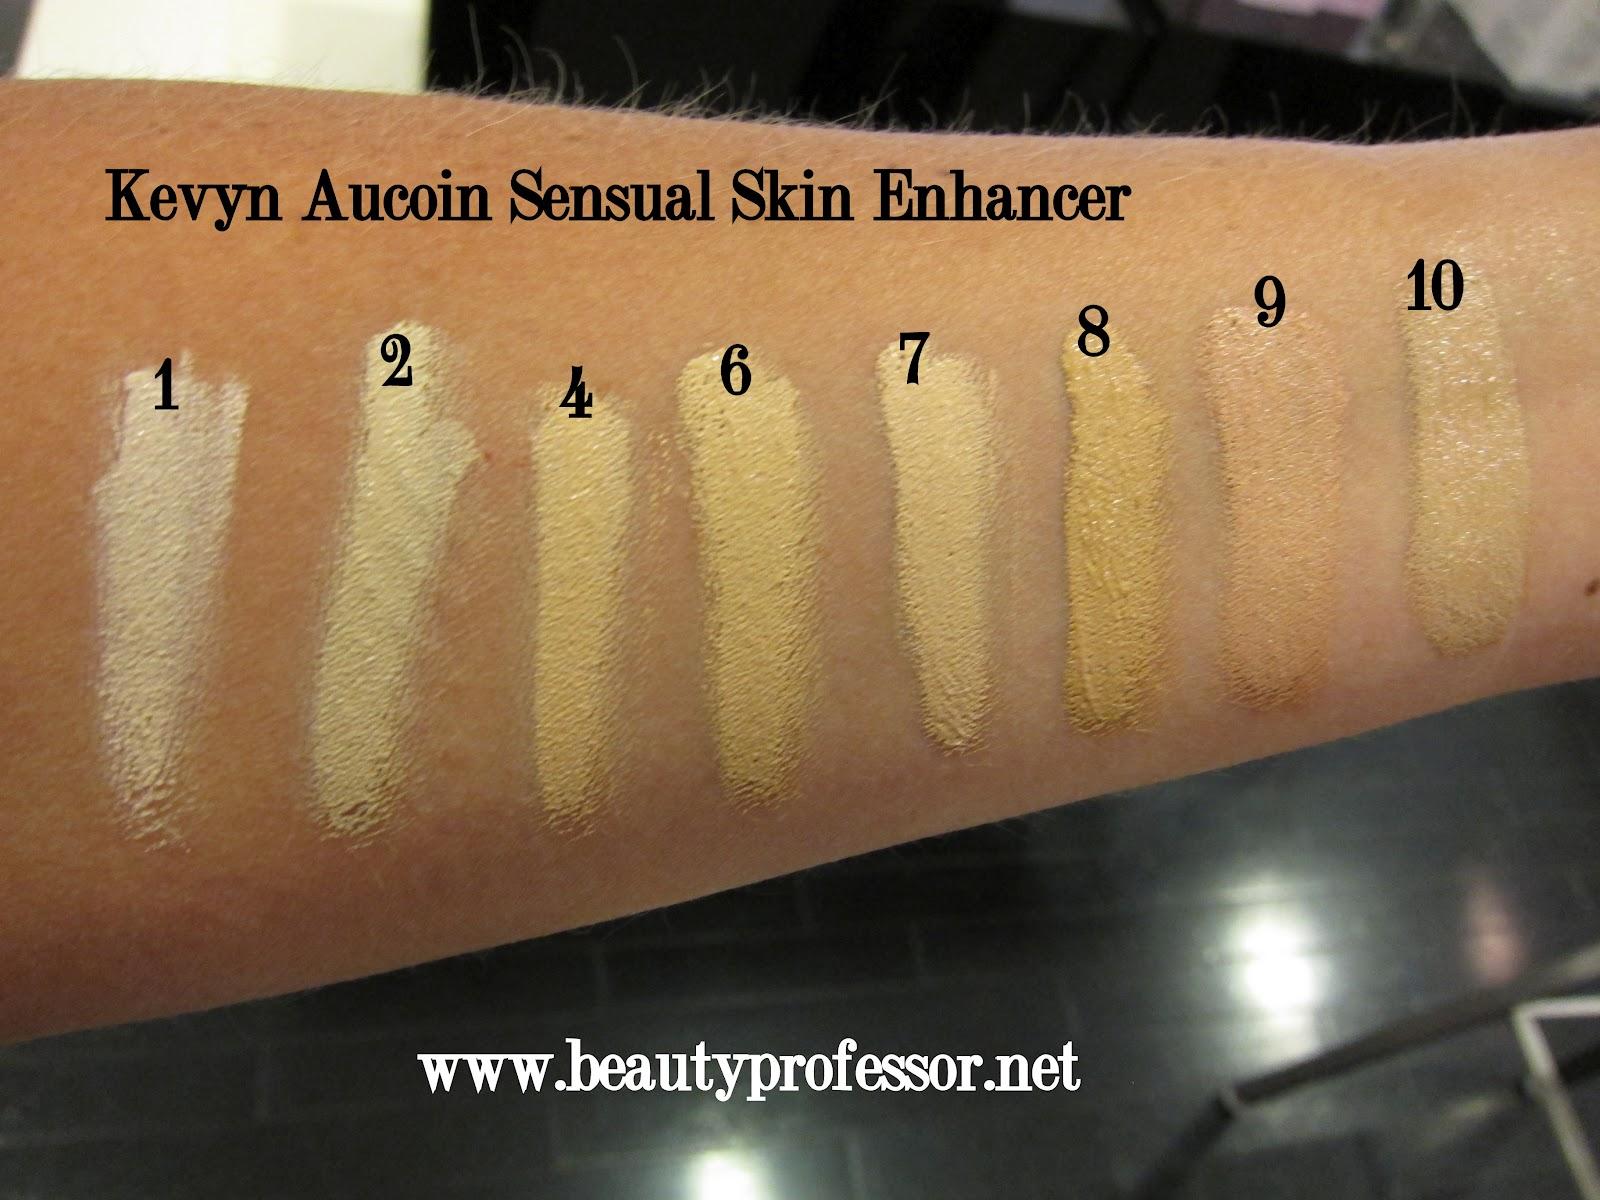 Beauty Professor: Kevyn Aucoin Sensual Skin Enhancer--All